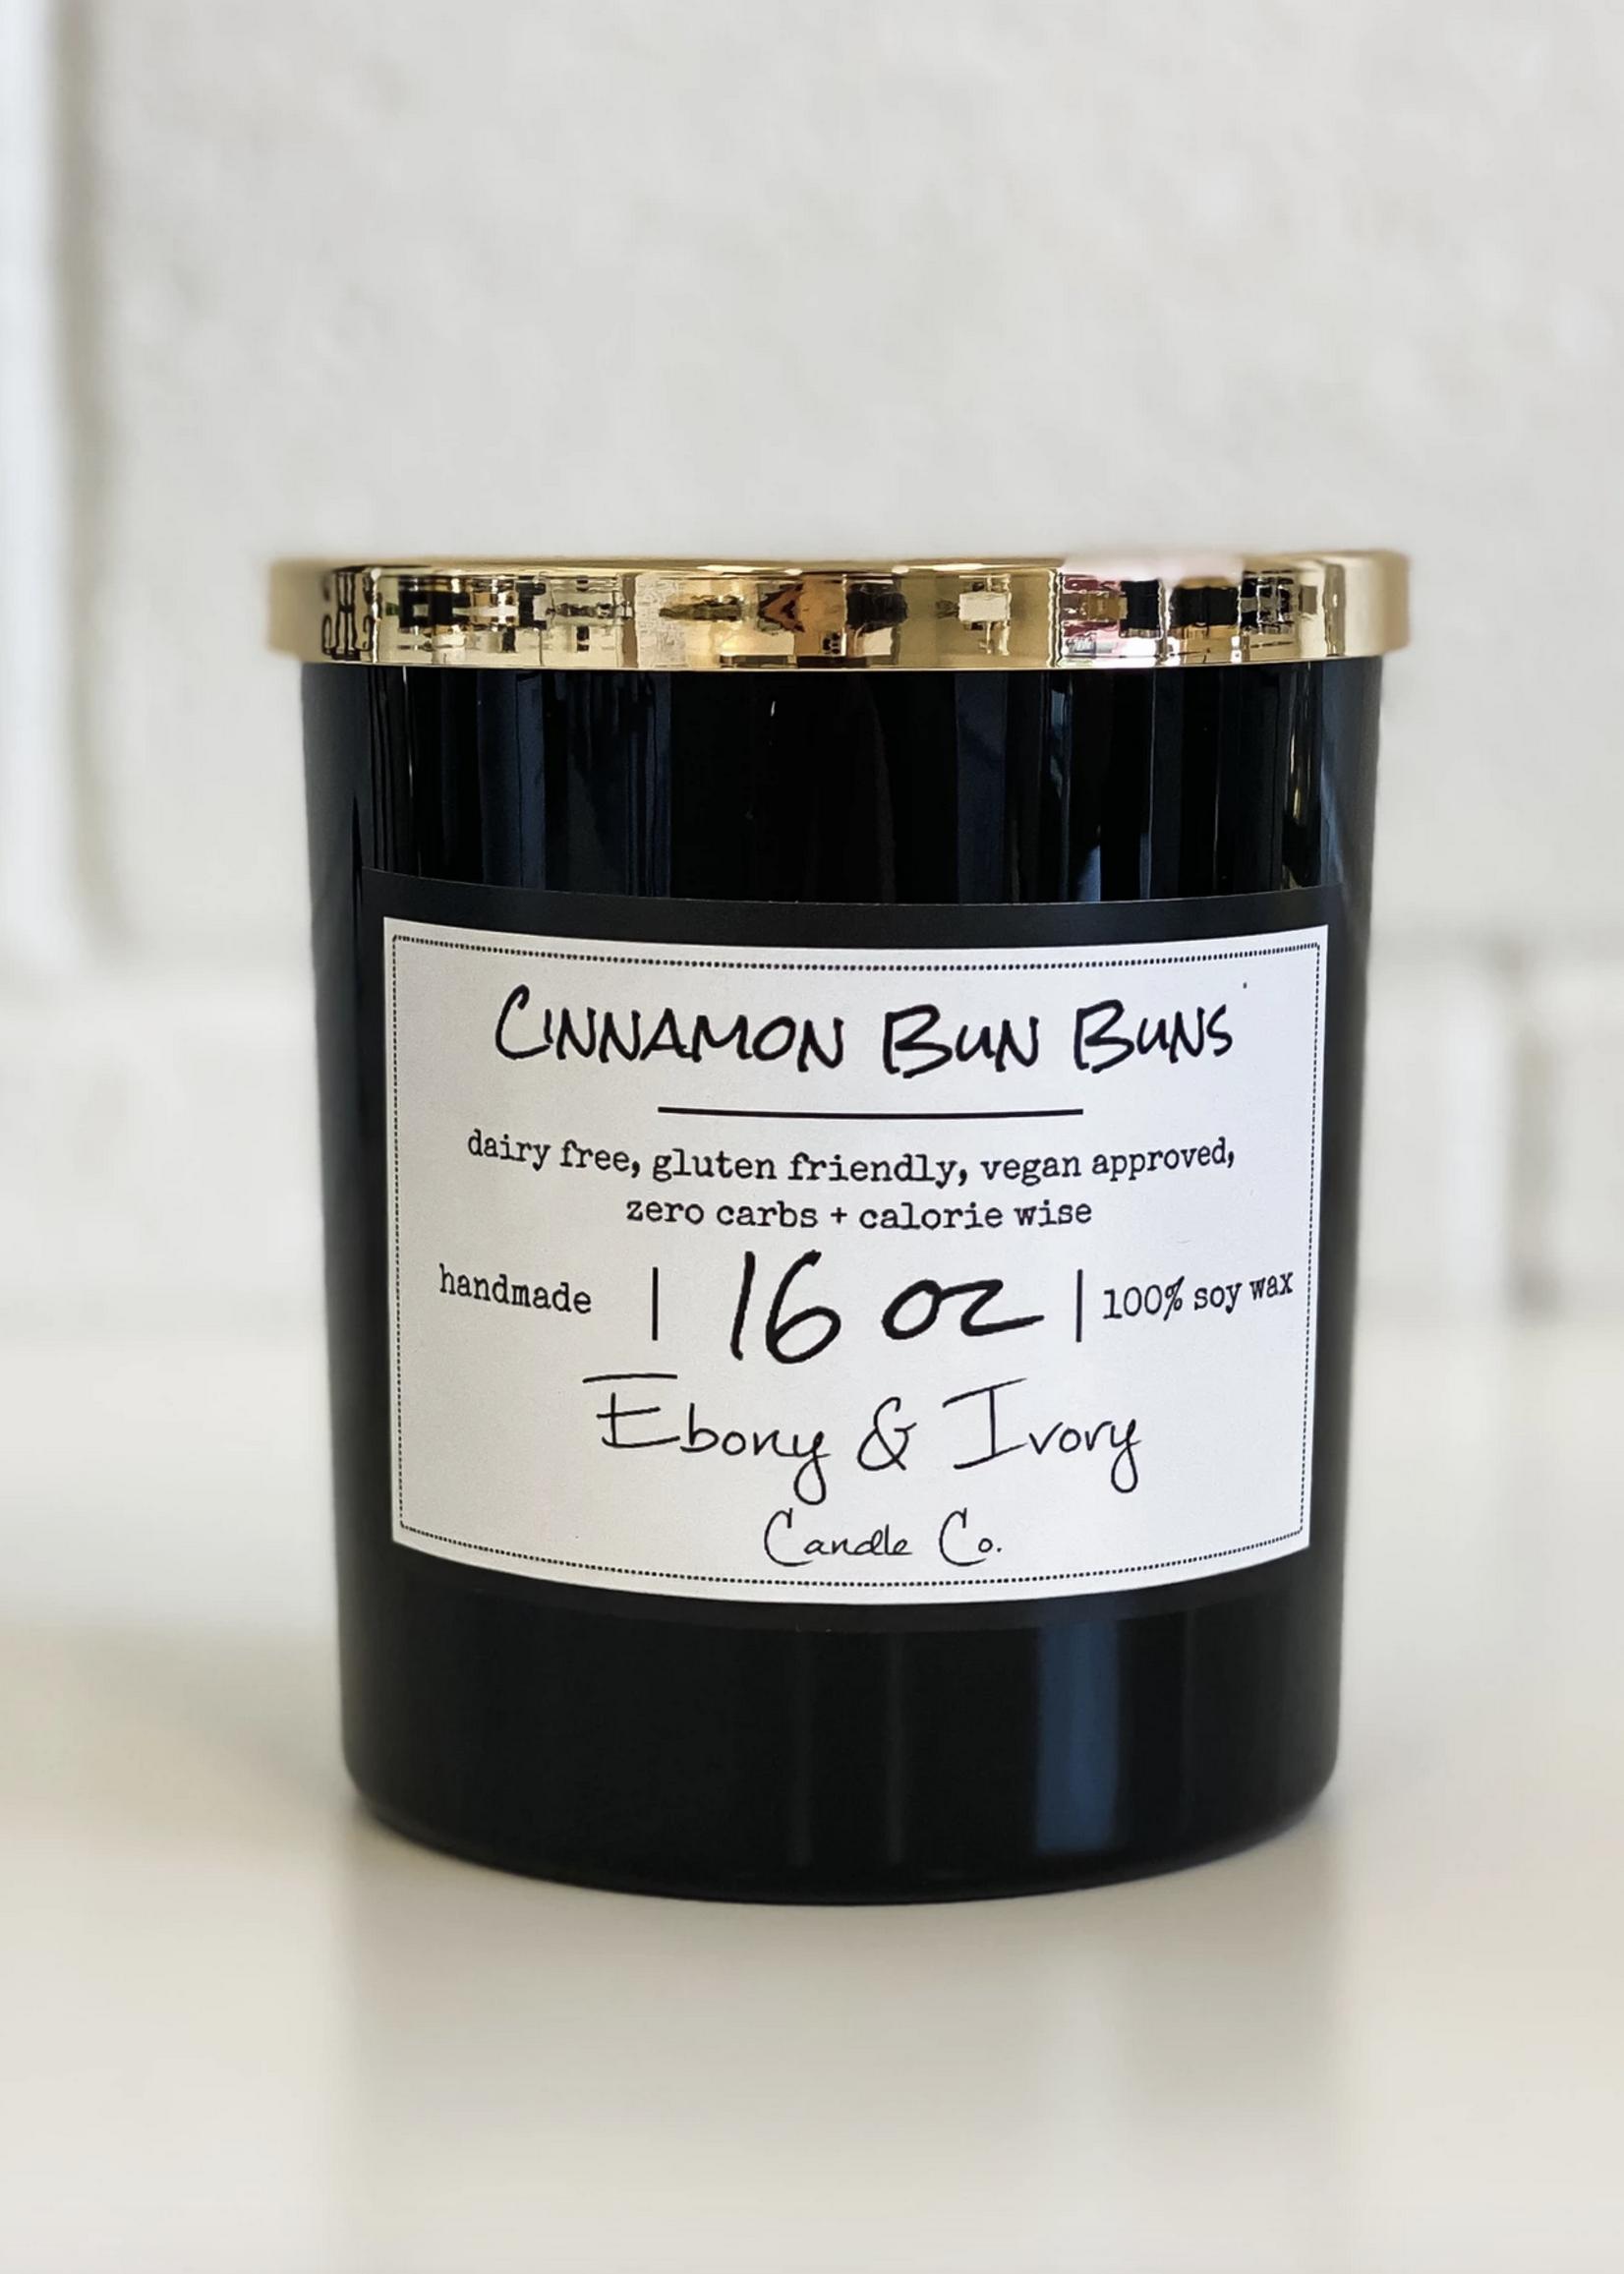 Ebony & Ivory Candle Co. Cinnamon bun bun 16 oz